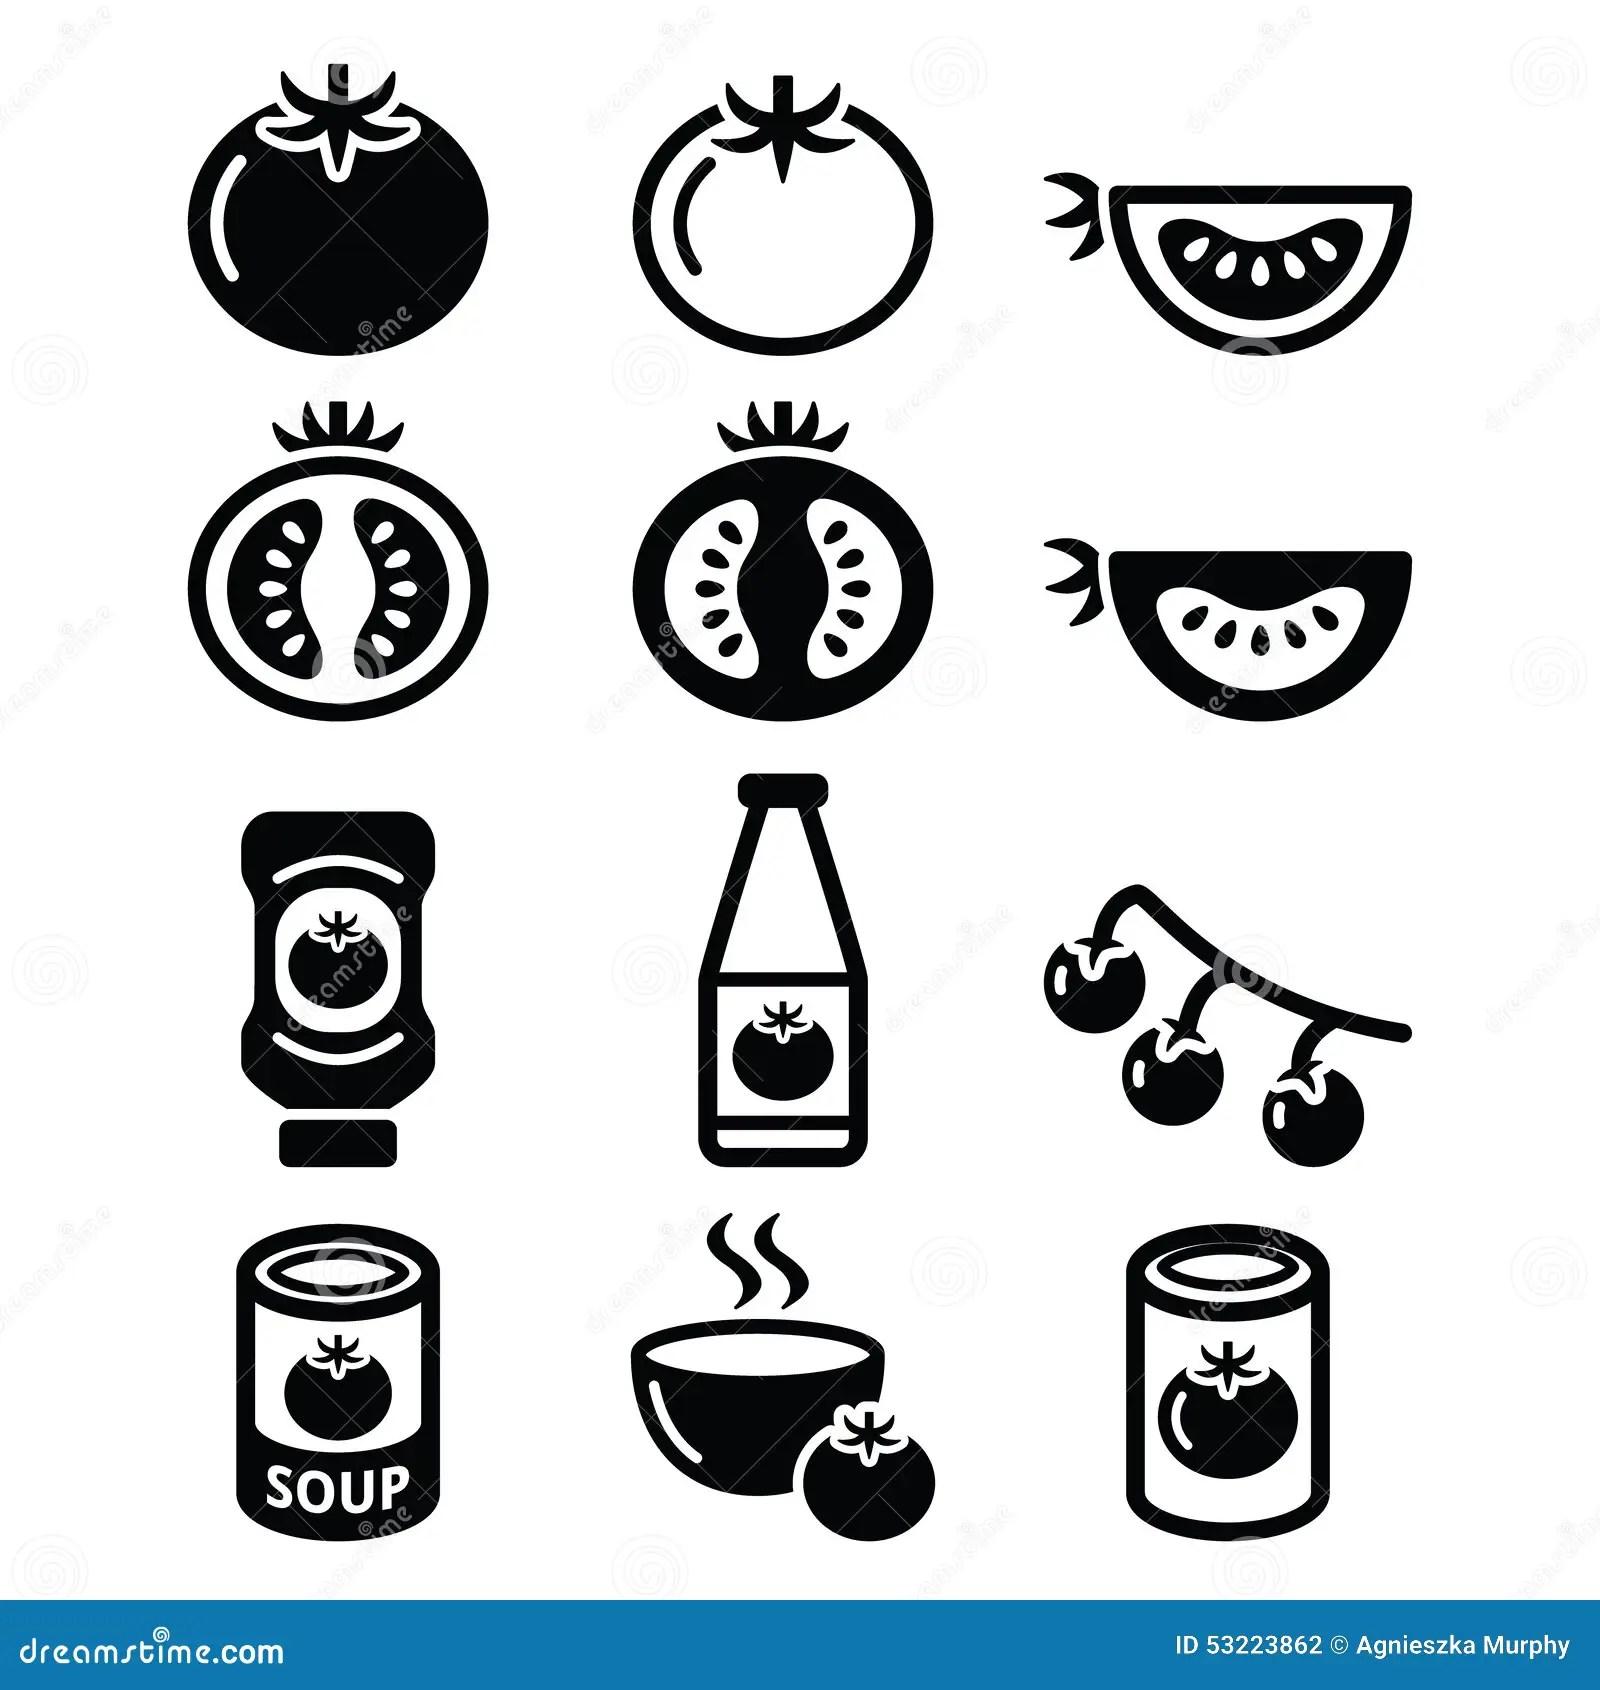 Tomato Ketchup Tomato Soup Icons Set Stock Illustration